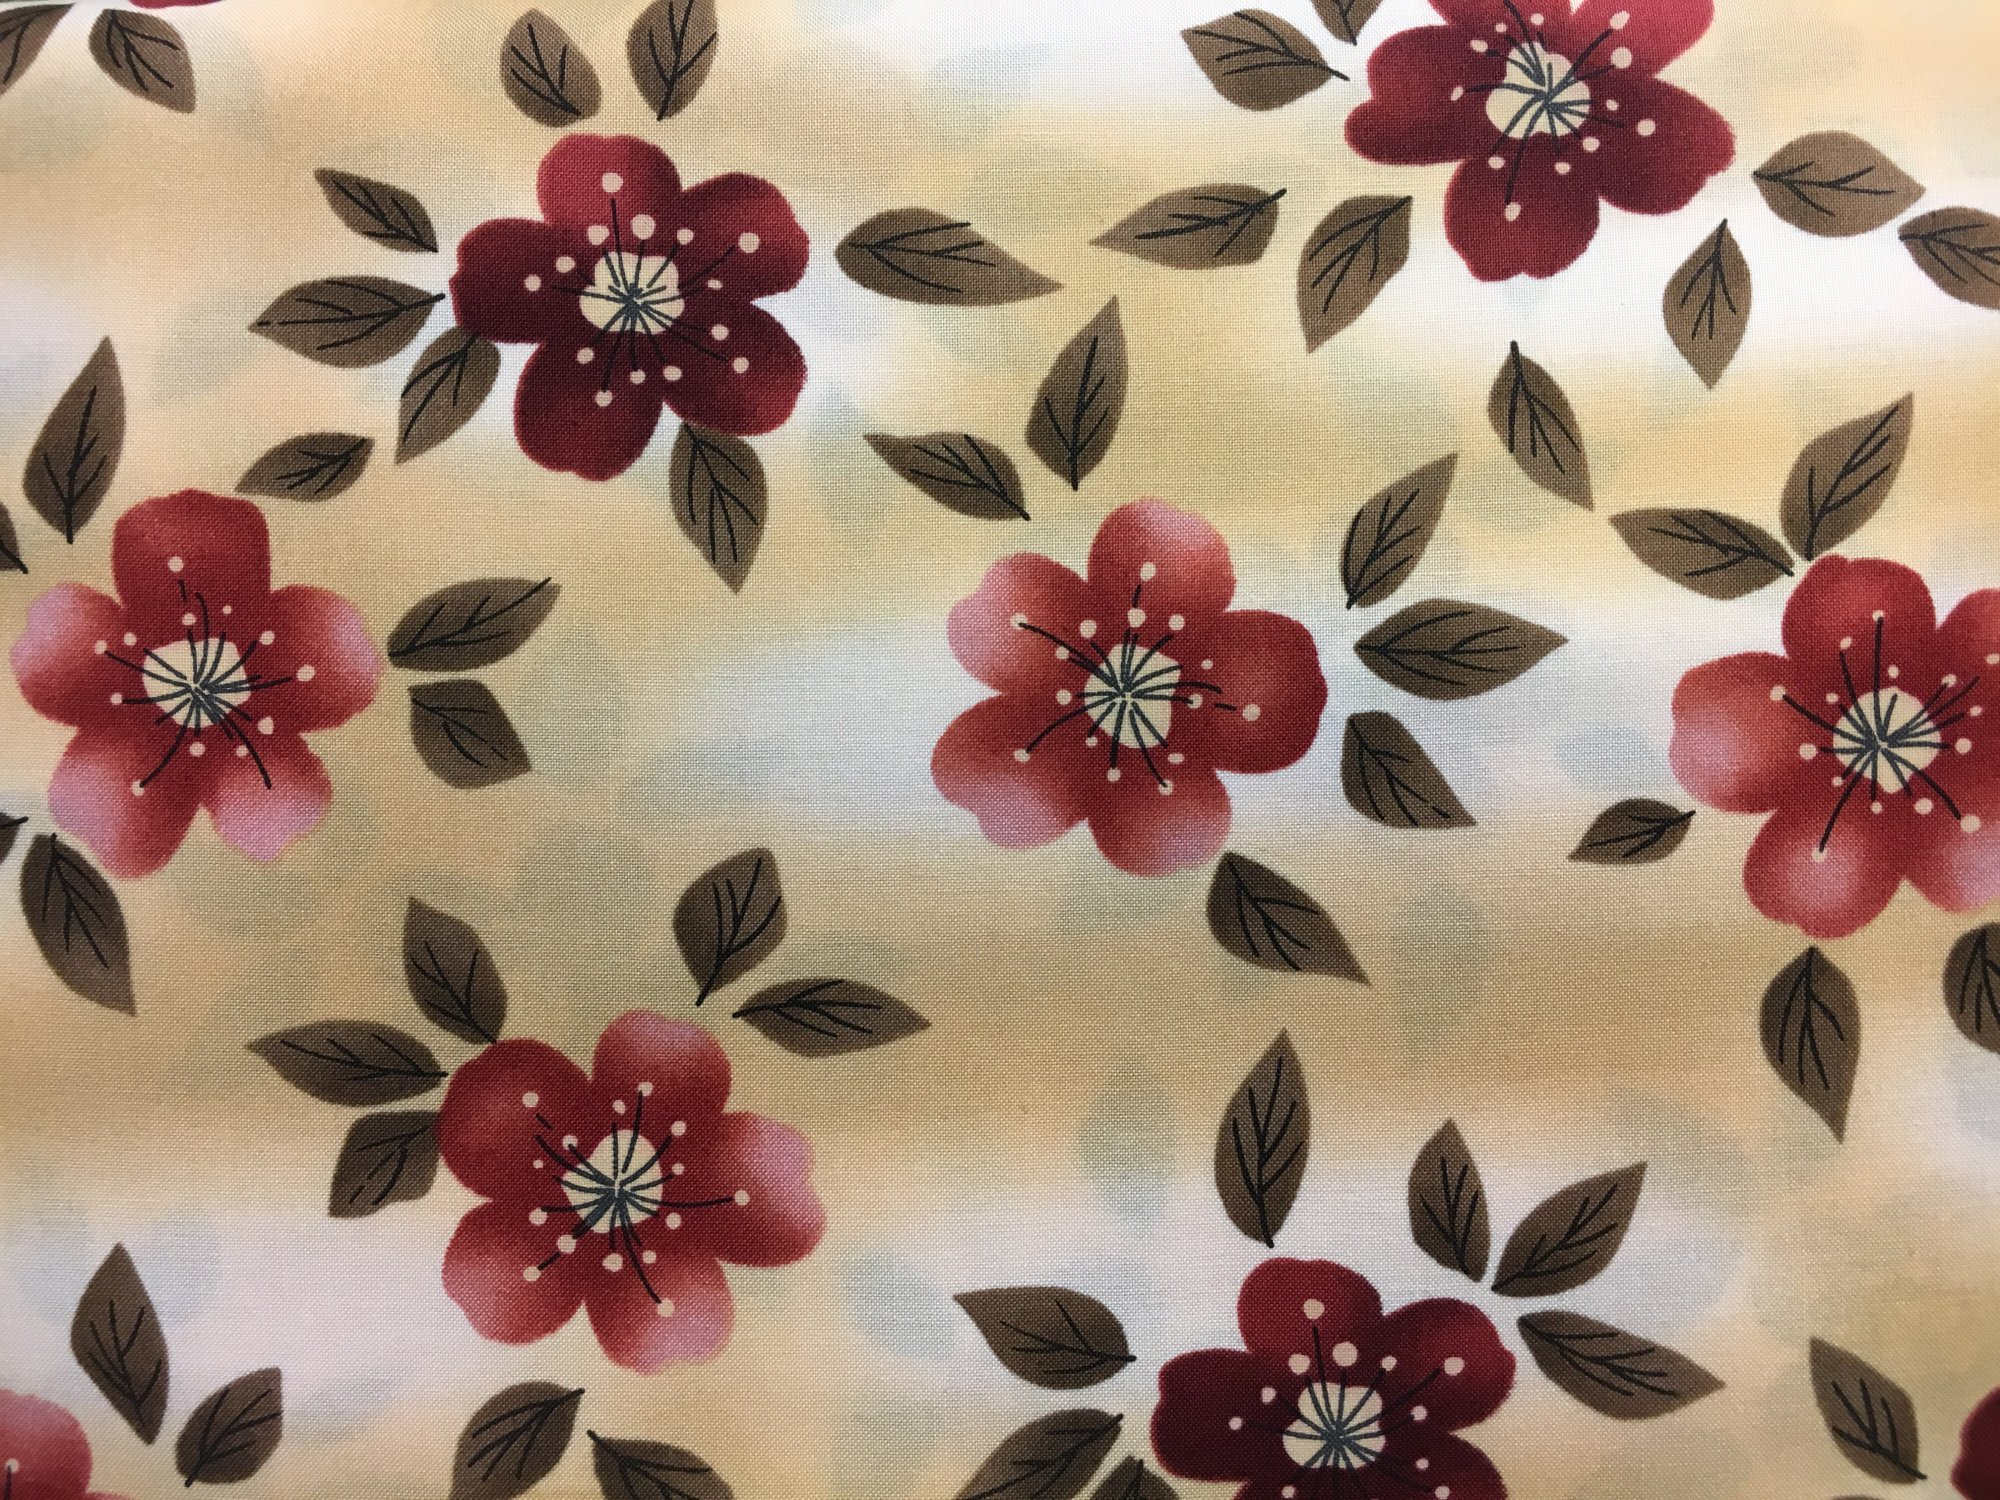 P&B textiles; Hana - floral